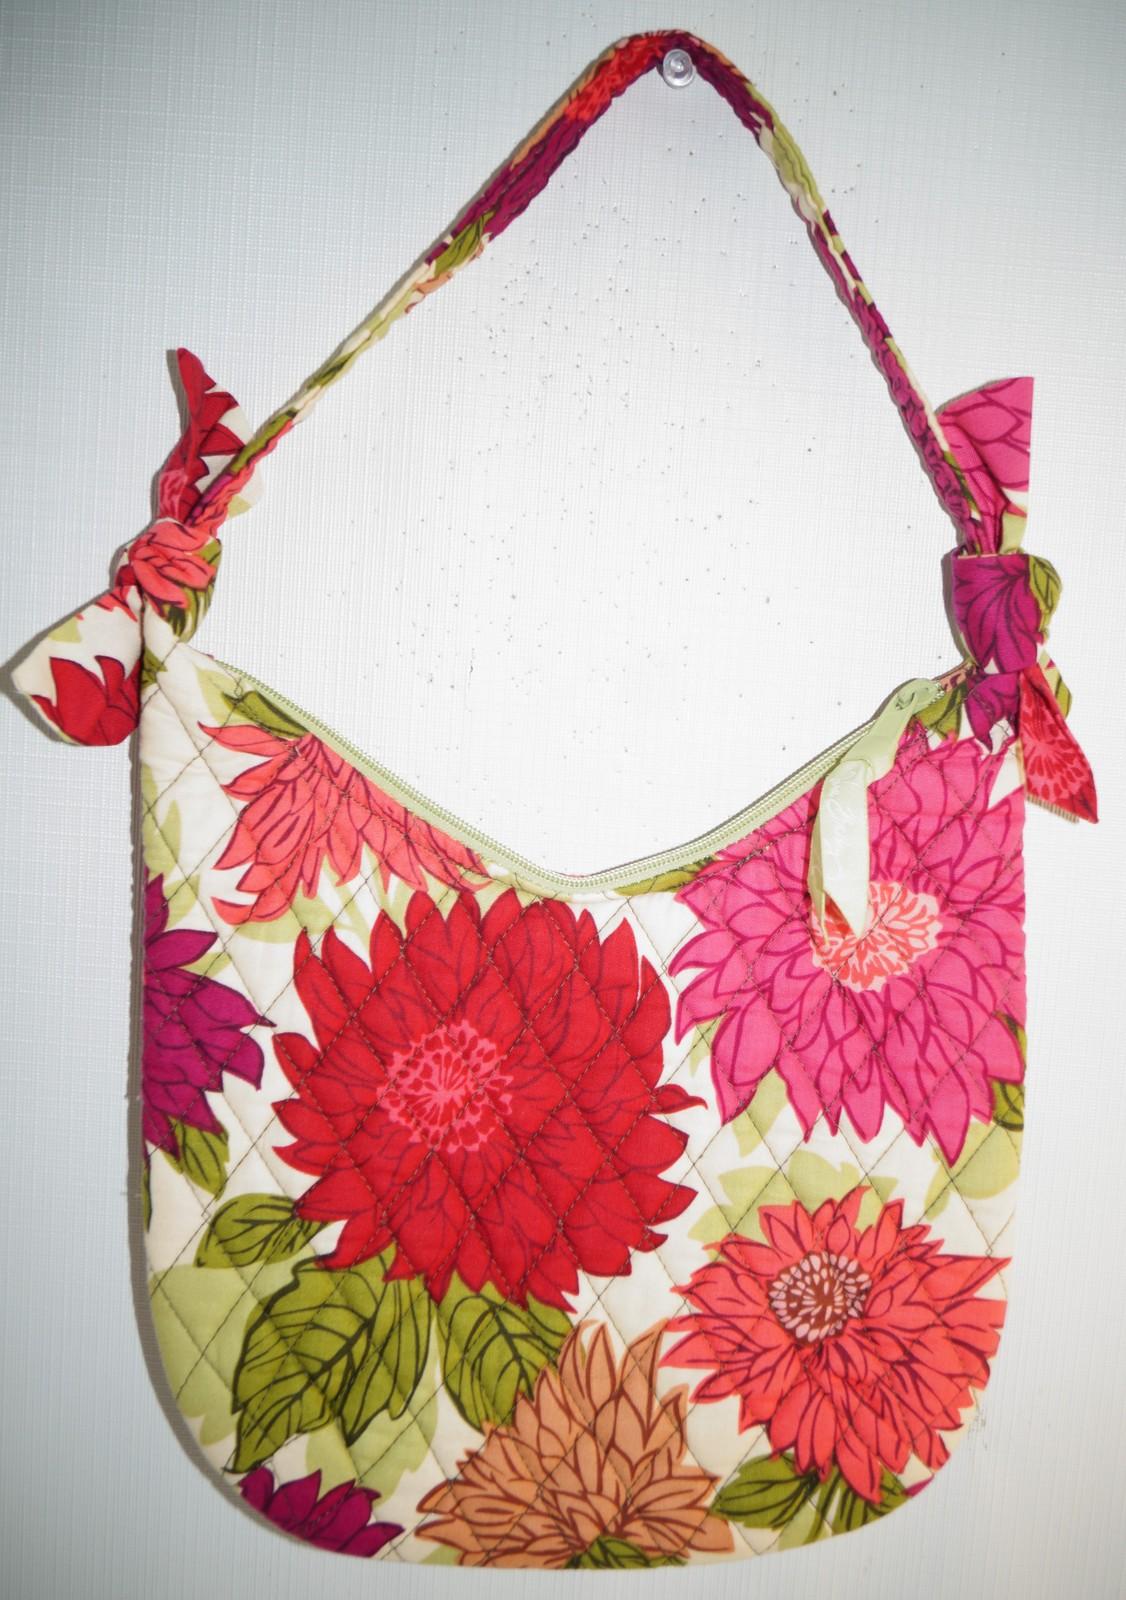 f05aca0081 Dsc02907. Dsc02907. Previous. Vera Bradley Hello Dahlia Retired Hobo  Shoulder Bag Purse Pink Flowers